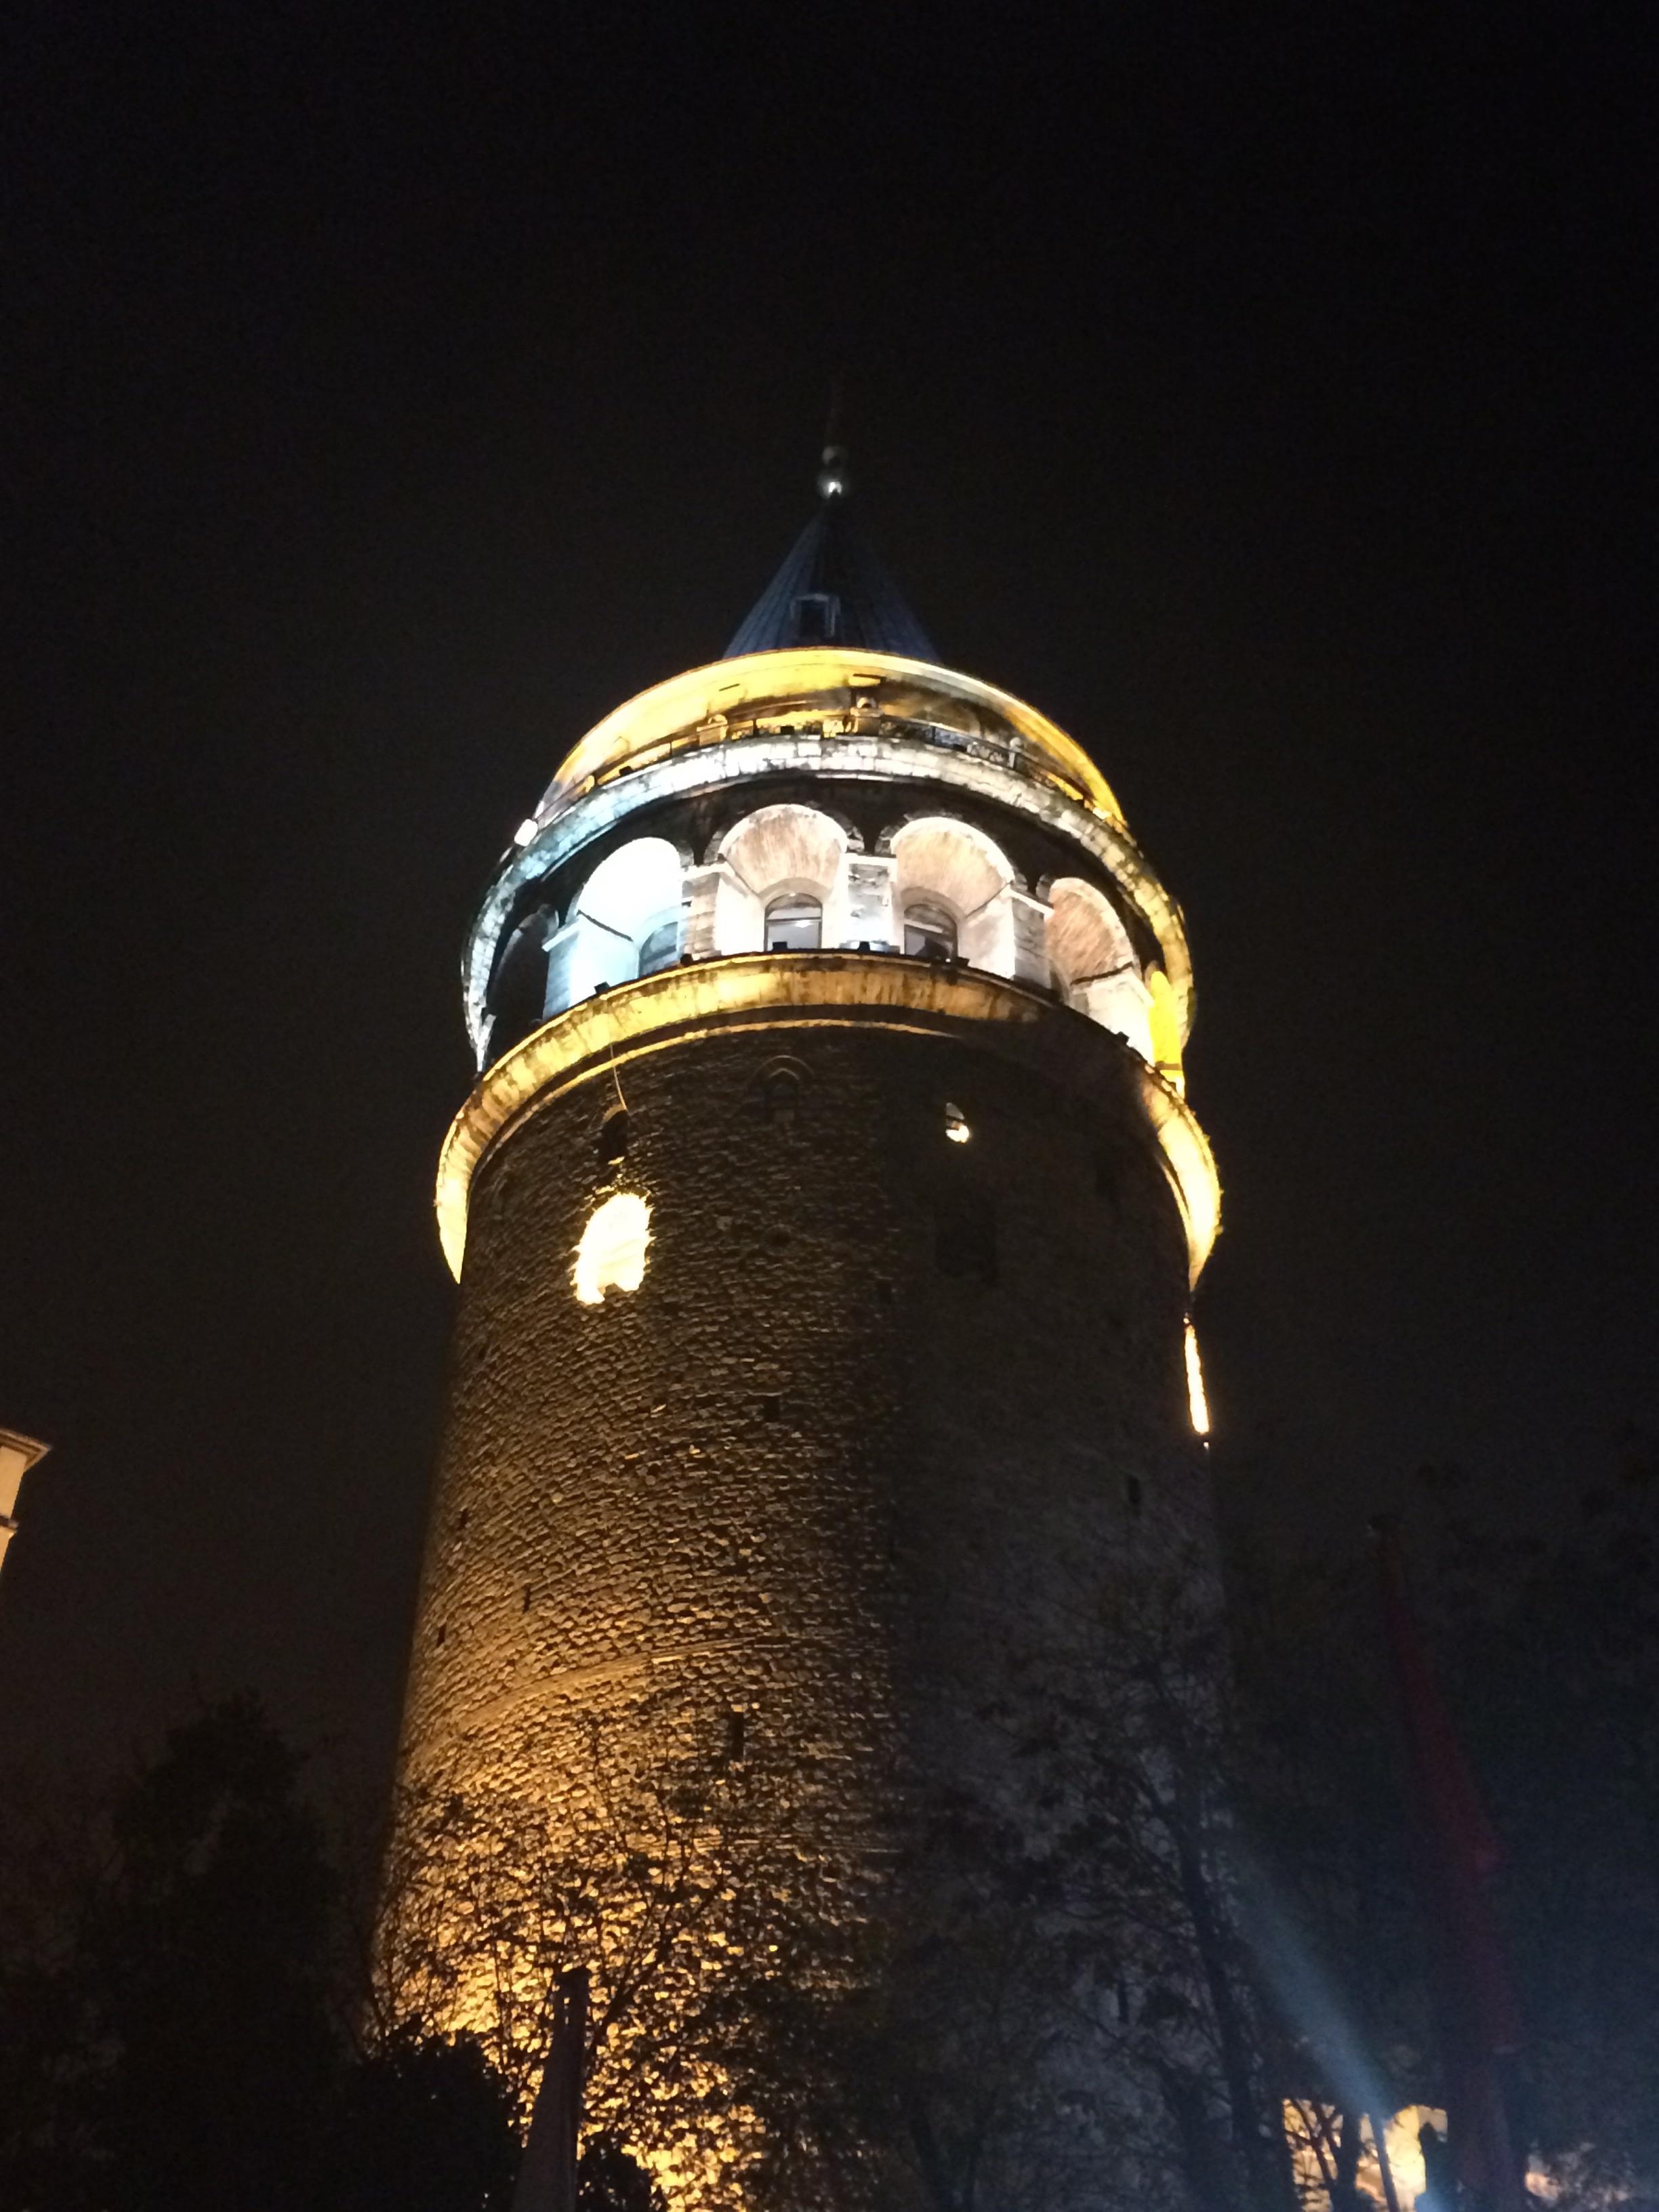 The Galata Tower at night.